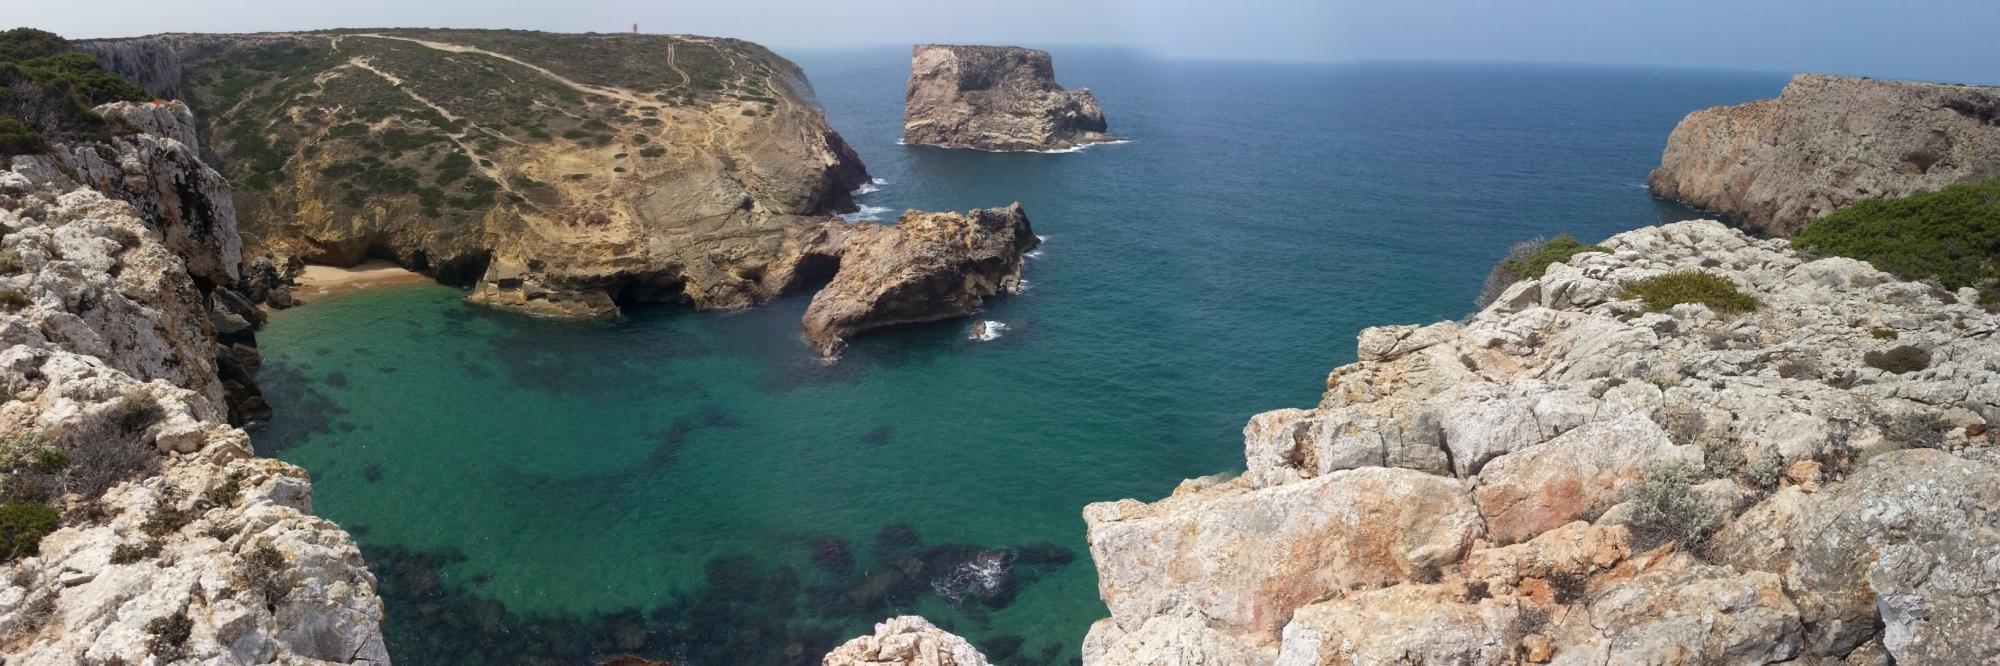 La dernière crique de la Rota Vicentina avant Cabo Sao Vicente